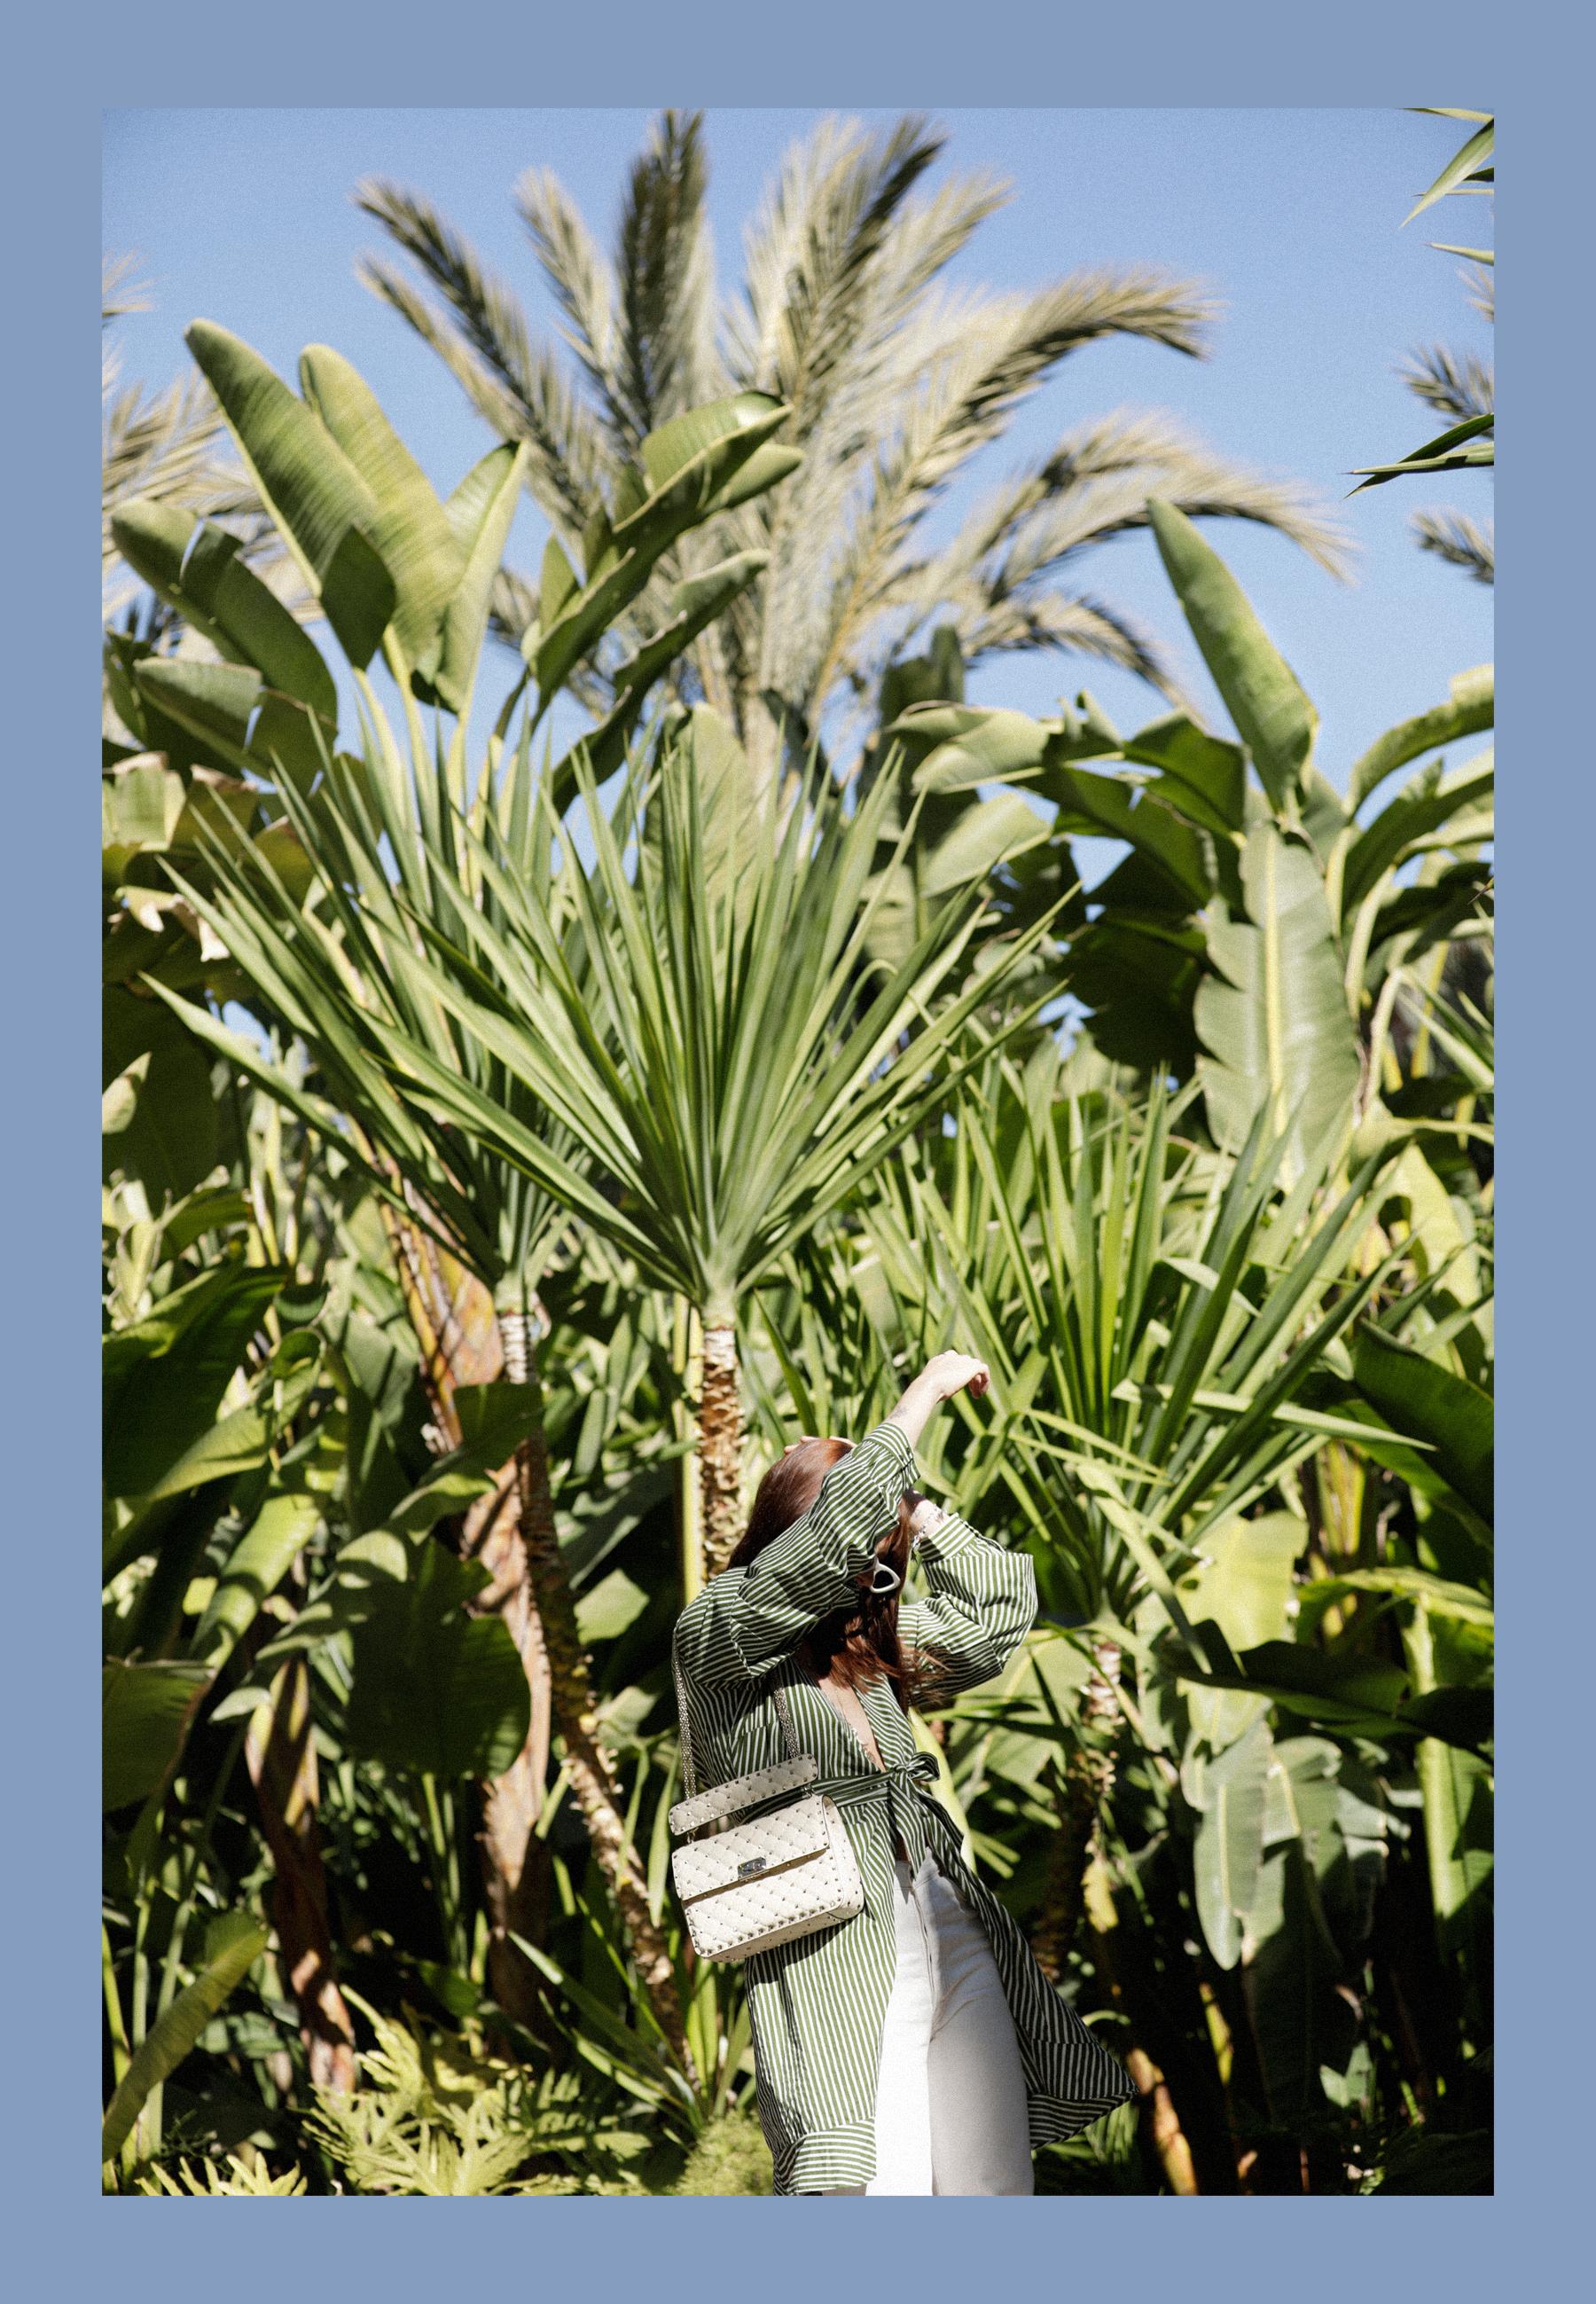 selman marrakech jungle palm tree banana leaves green dress vila breuninger maison valentino hermès oran adam selman x le specs sunglasses last lolita dress as top stripes green max bechmann fotografie film düsseldorf ricarda schernus catsanddogsblog 8